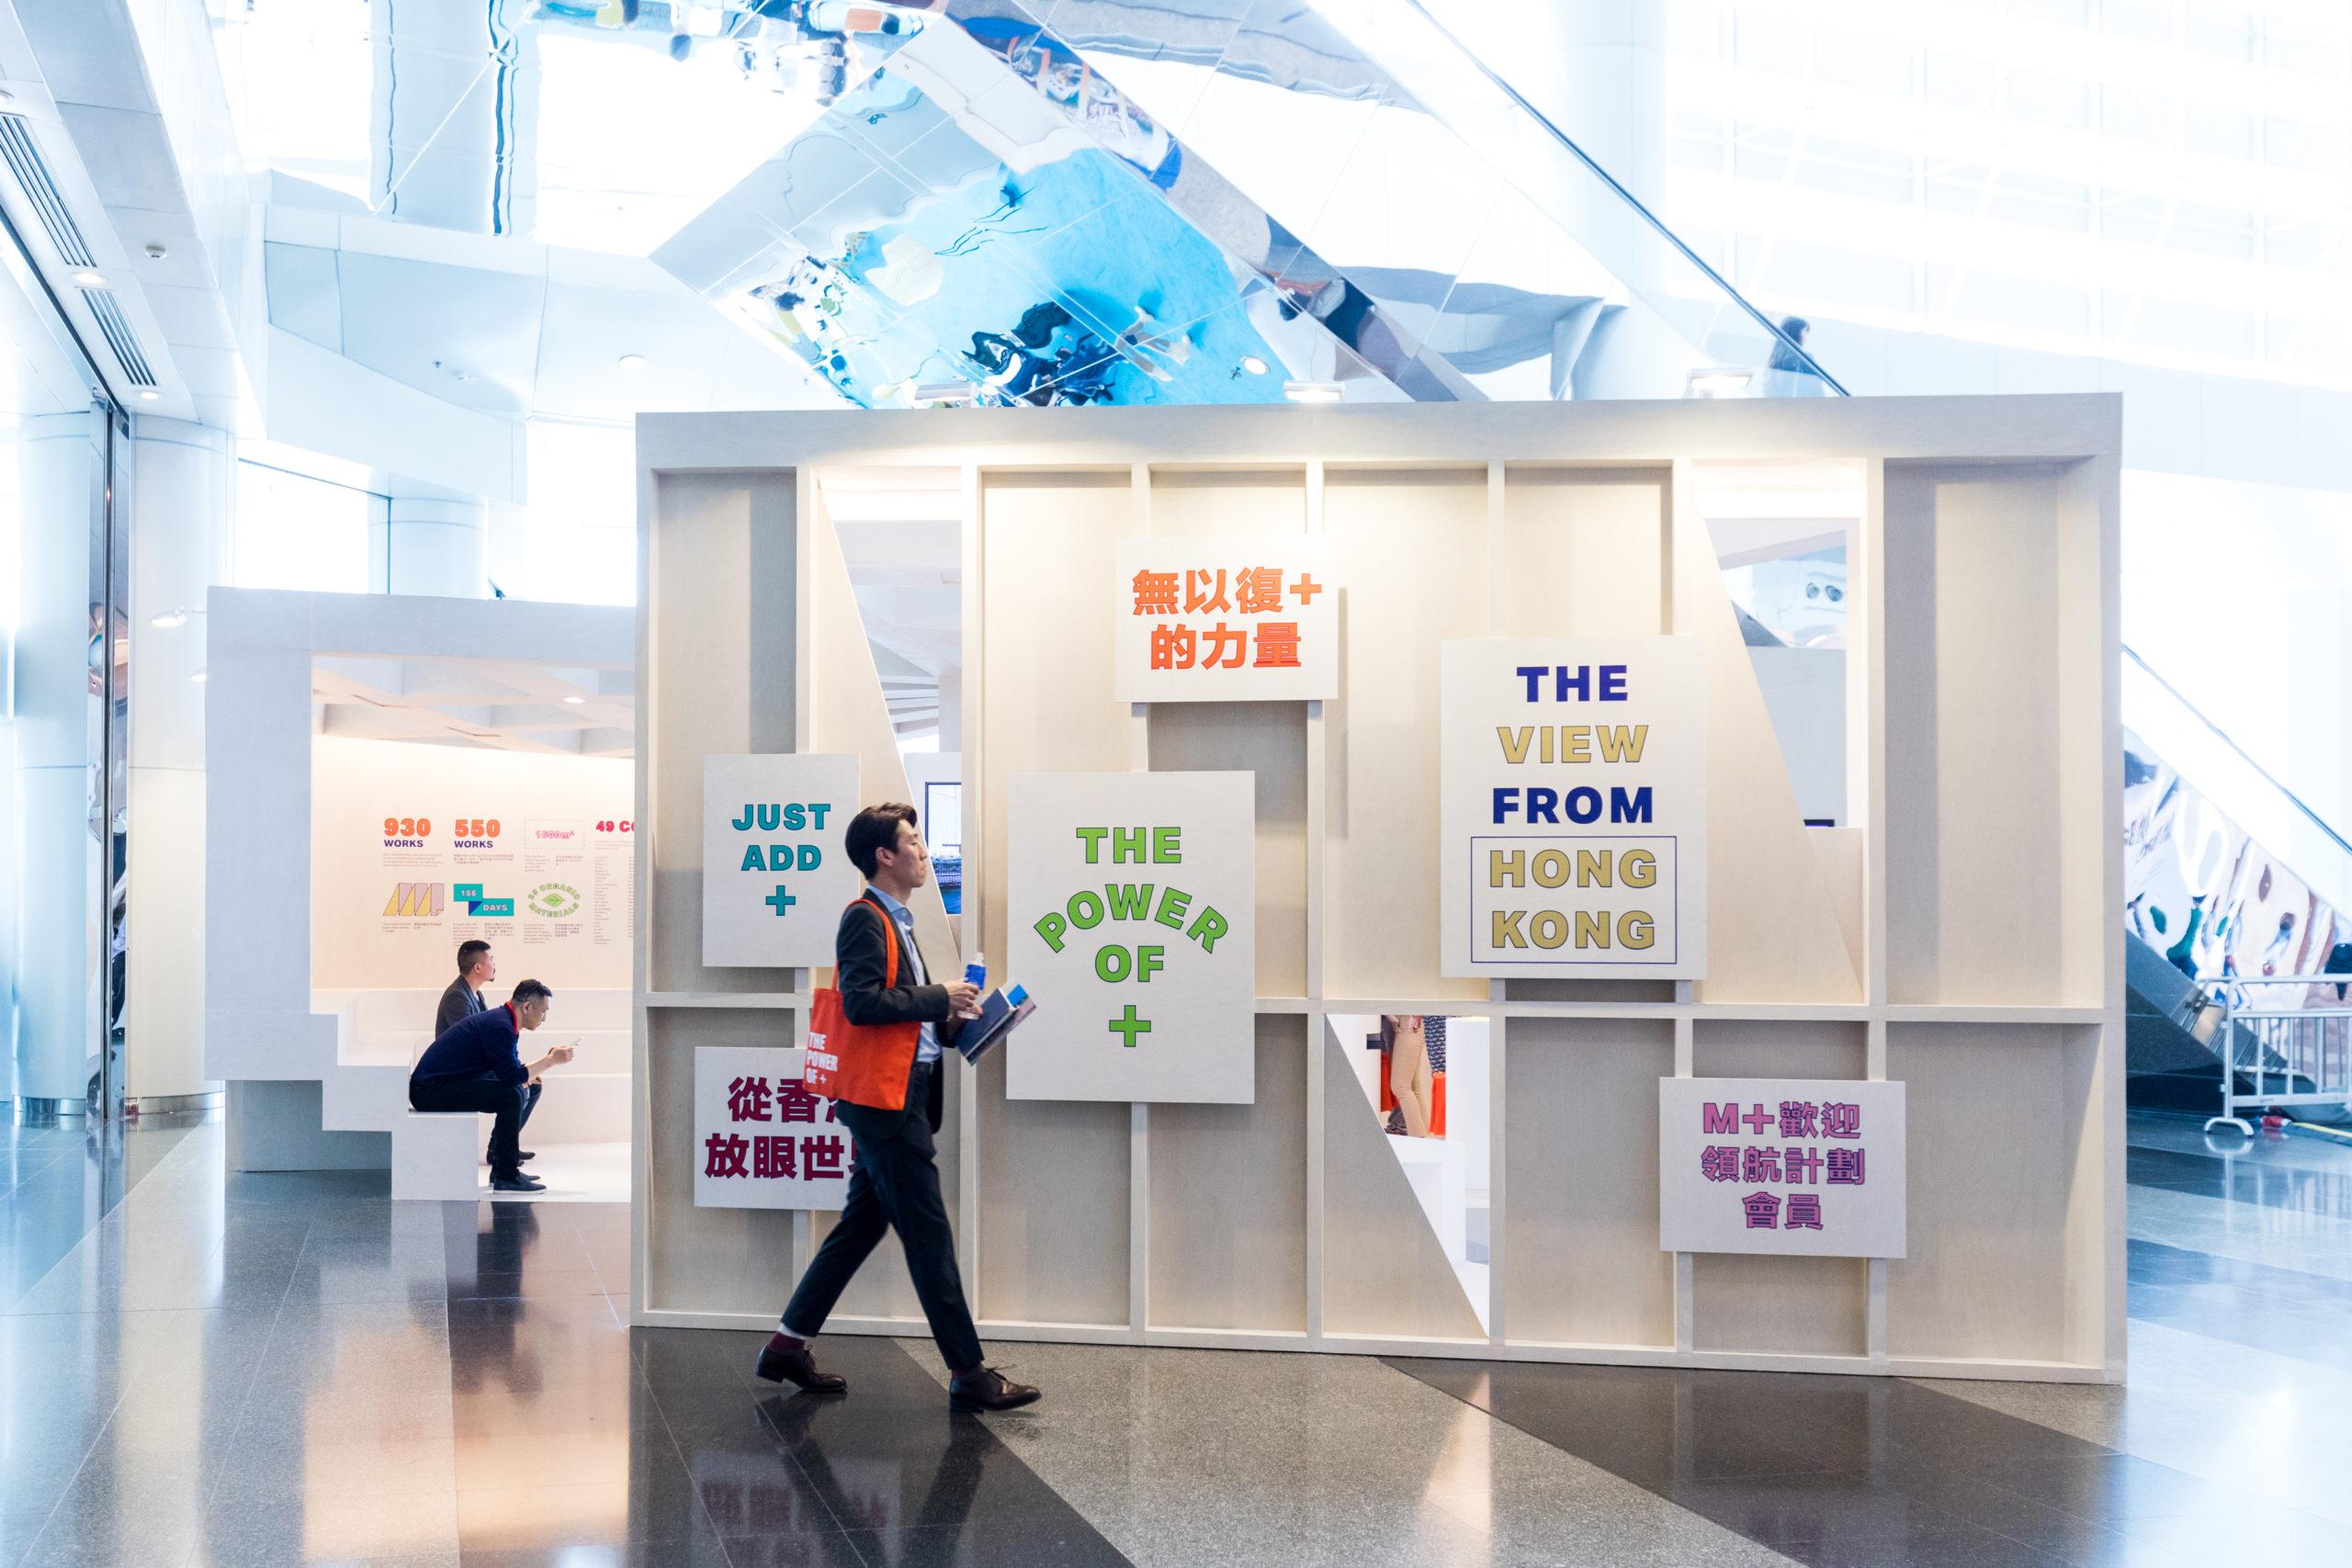 spatial practice architecture office Los Angeles Hong Kong m+ museum pavilion art basel hong kong the pavilion